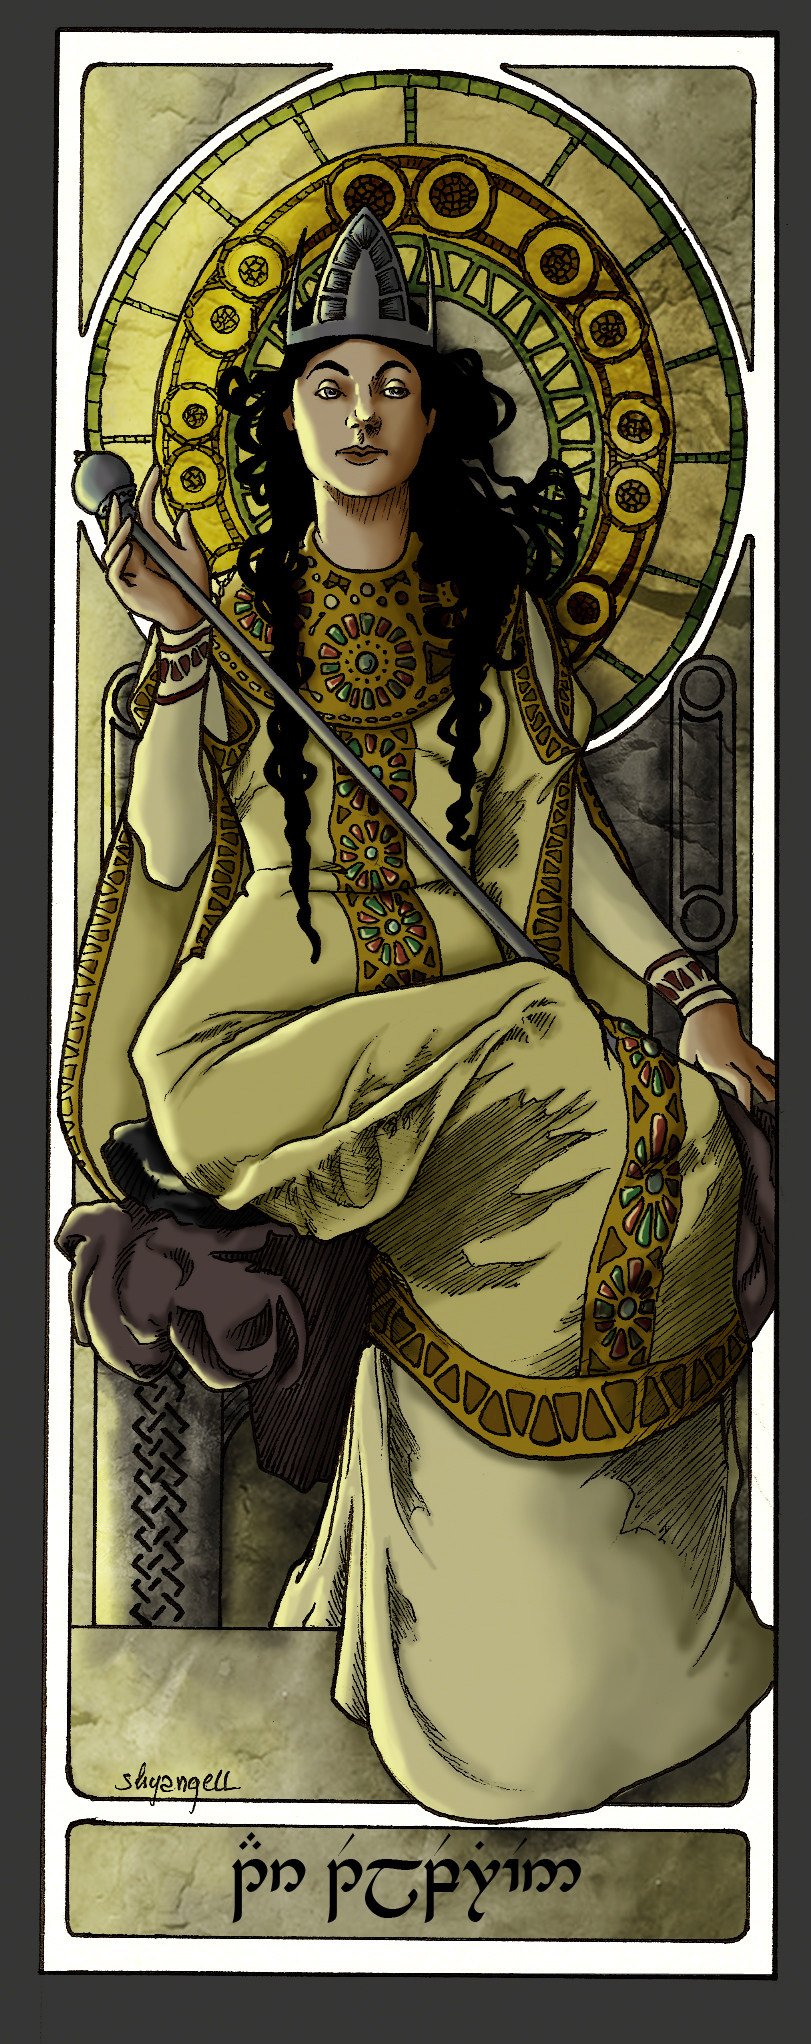 Queens Of Numenor - Tar-Telperien by shyangell